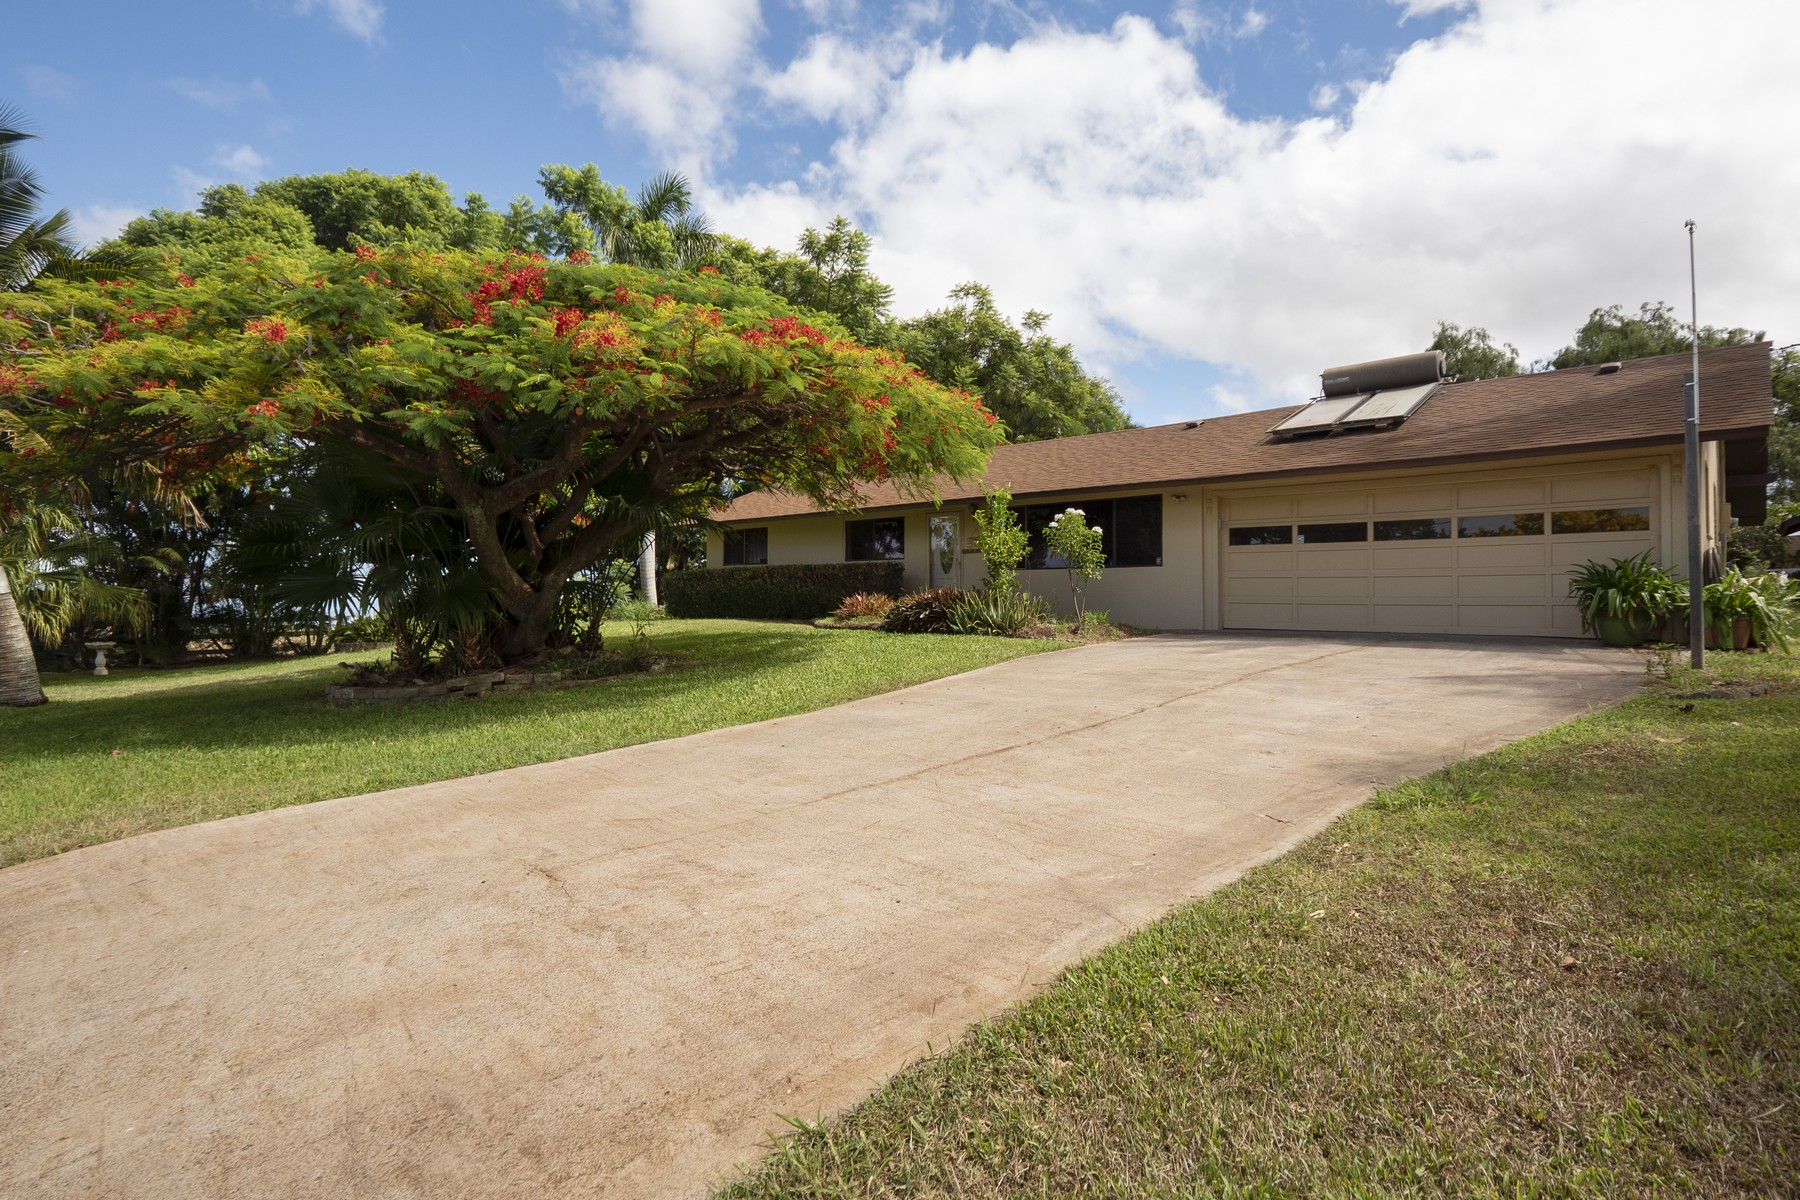 農場 / 牧場 / 種植場 為 出售 在 Serene Upcountry Kula Coffee Farm 658 Piliwale Road Kula, 夏威夷 96790 美國